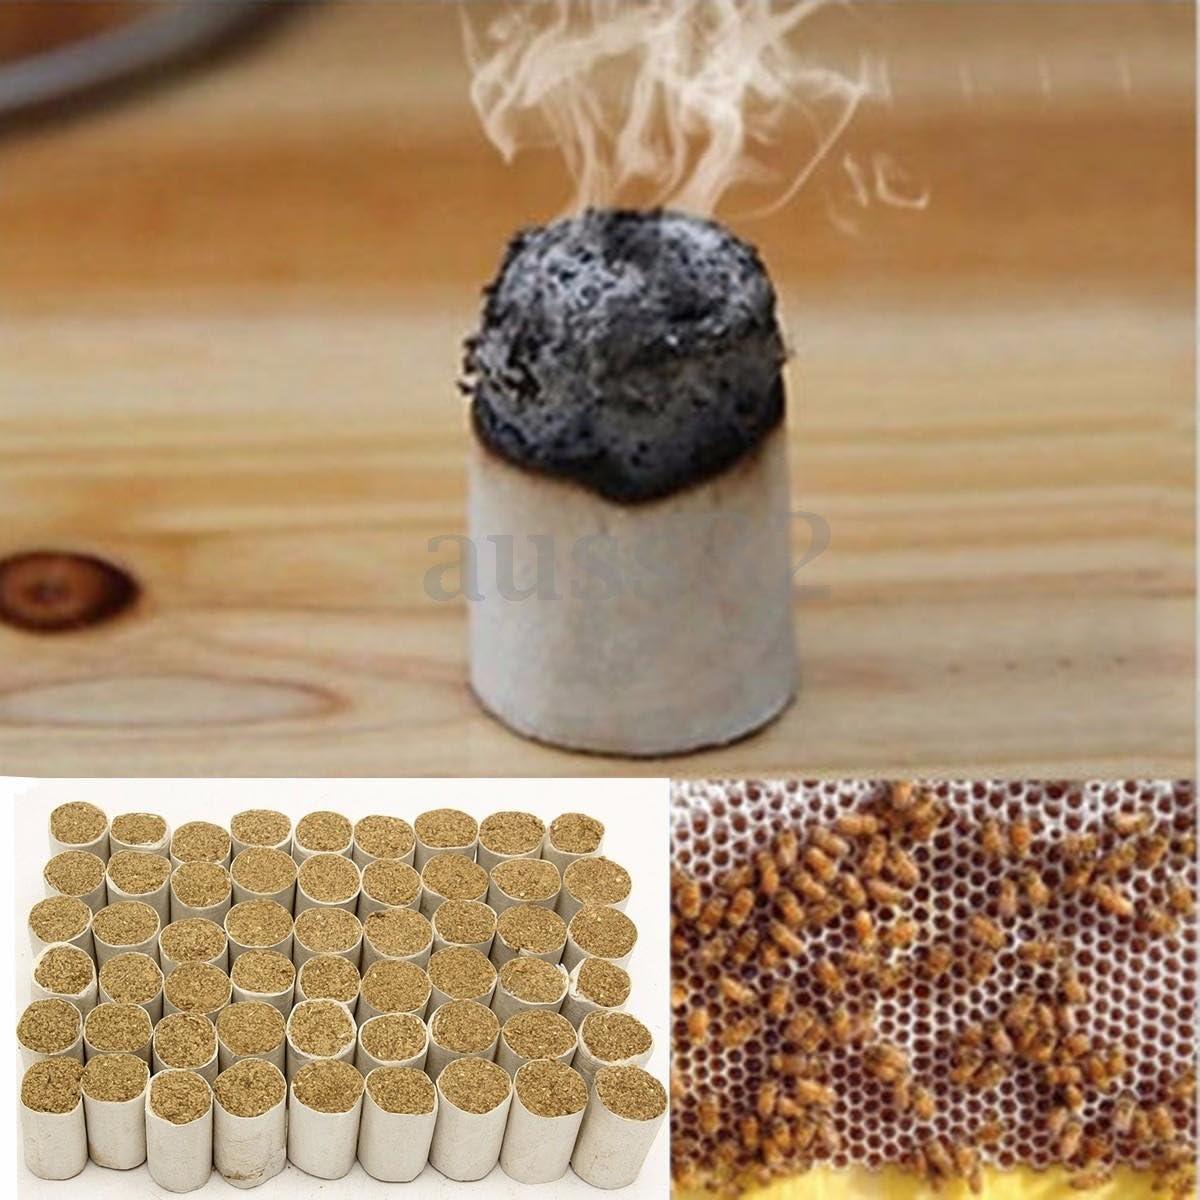 54Pcs Beekeeping Tools Bee Hive Smoker Fuel Chinese Herb Smoke Honey Made